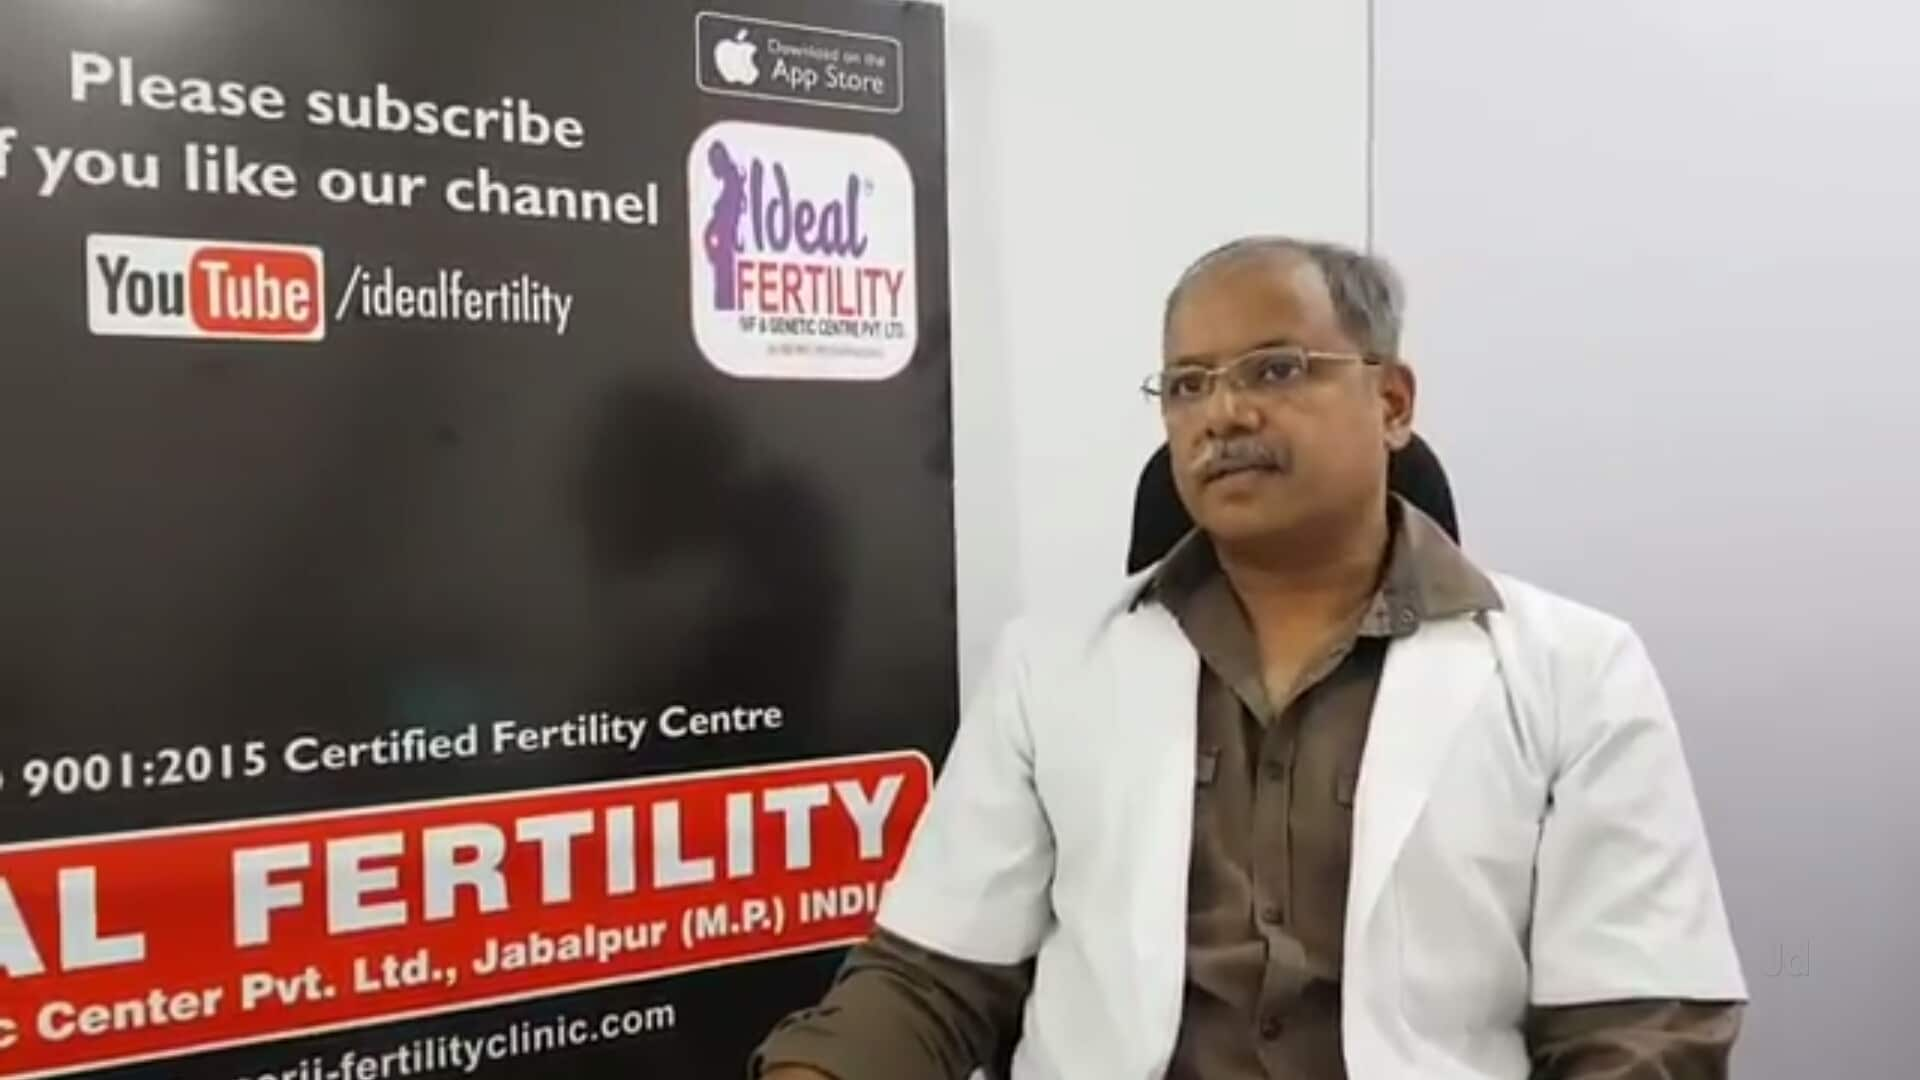 Top Sperm Banks in Jabalpur - Best Sperm Donation Centres